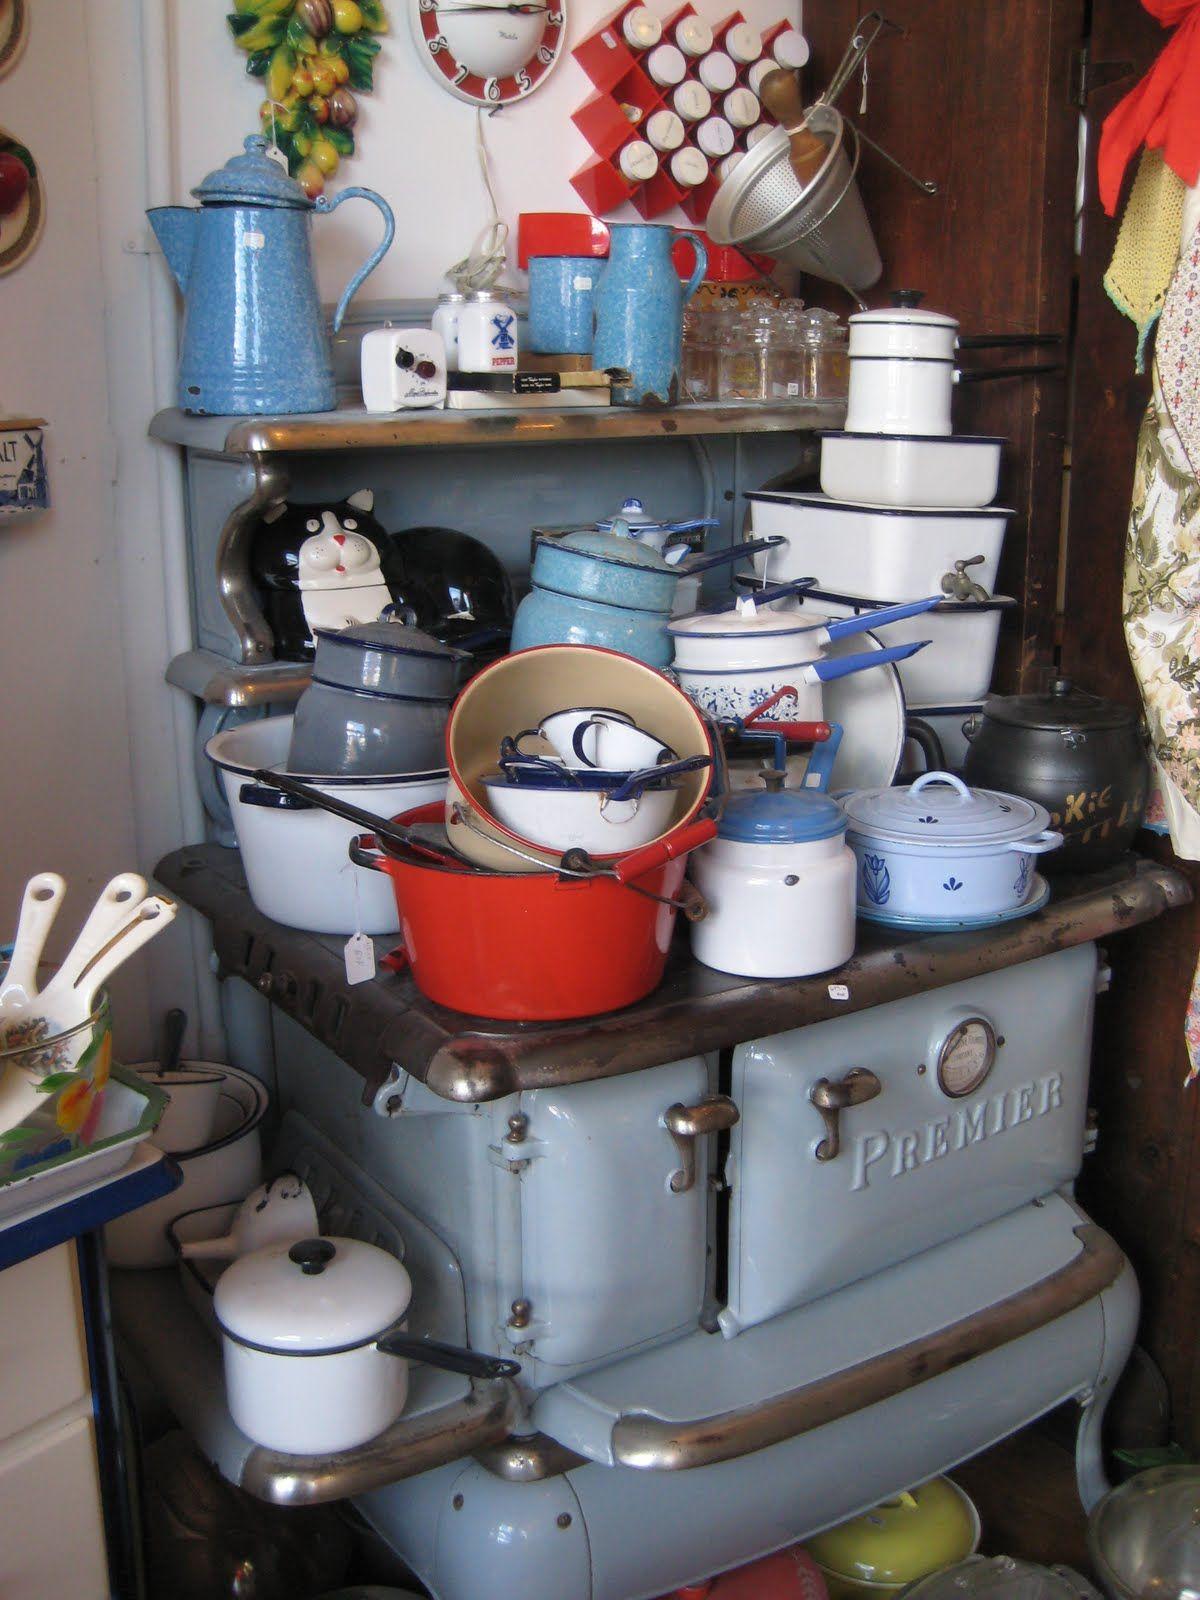 C. Dianne Zweig - Kitsch 'n Stuff: Buying Vintage Enamel Cookware, Bakeware, Ovenware And Roasting Pans